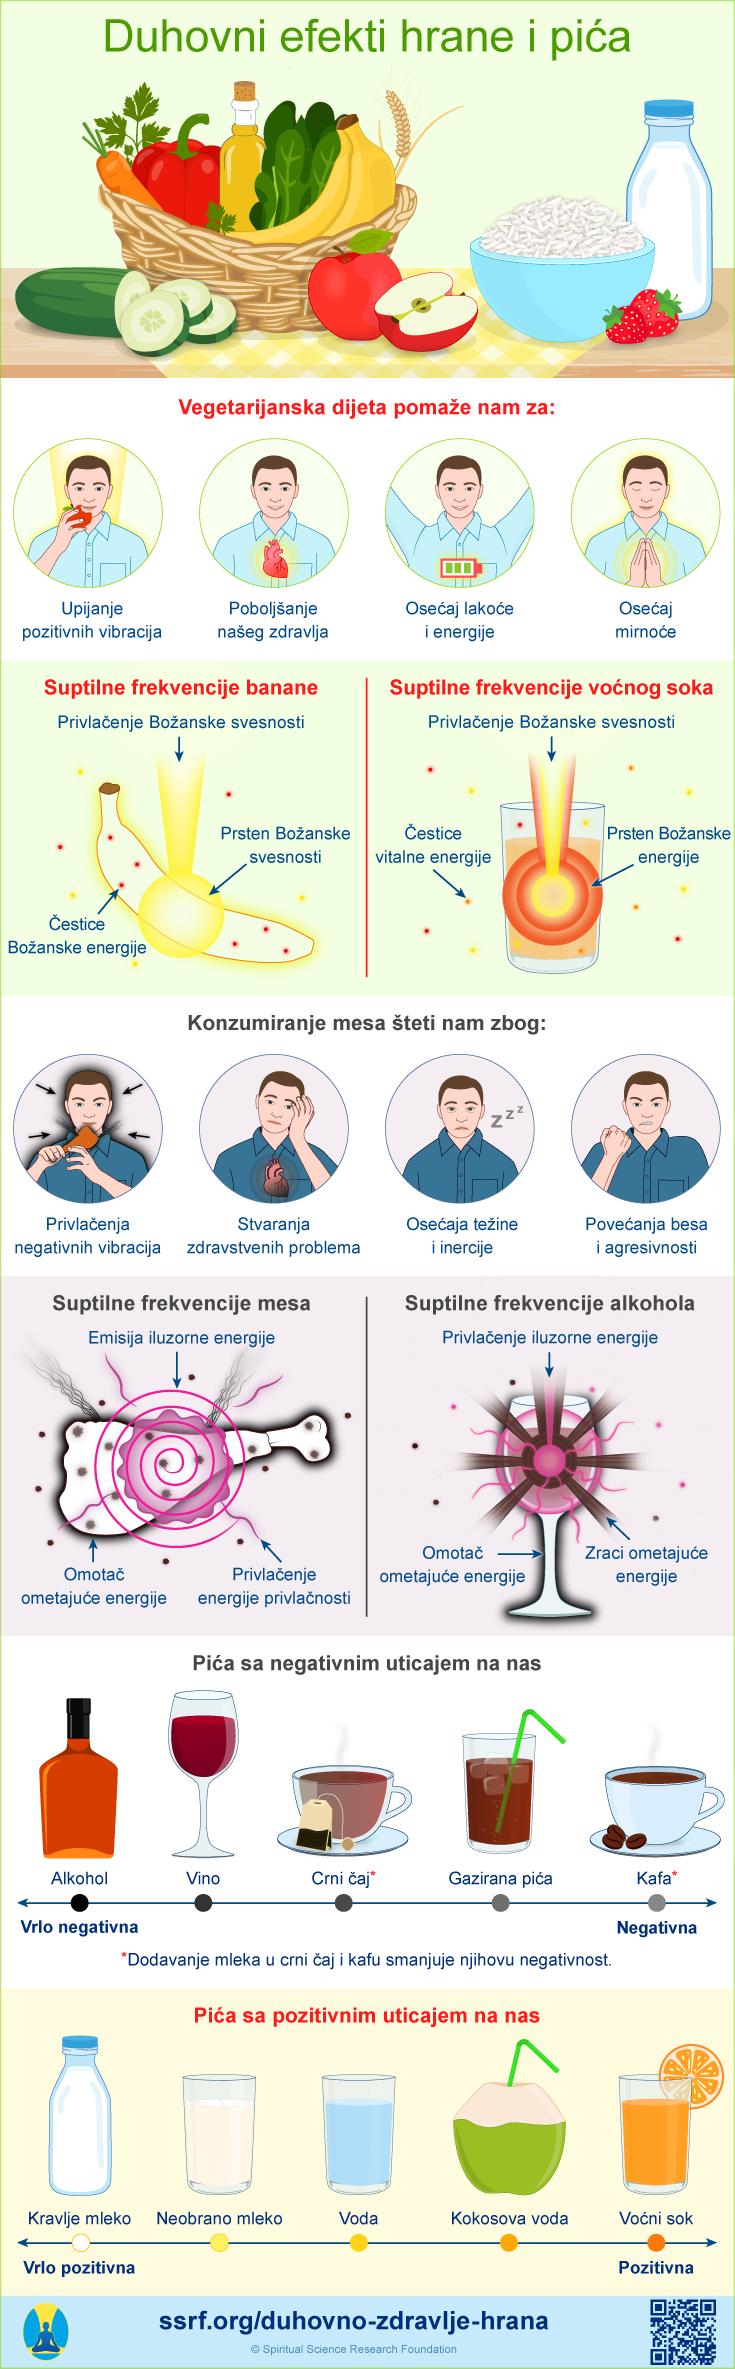 Duhovni efekti pića i hrane